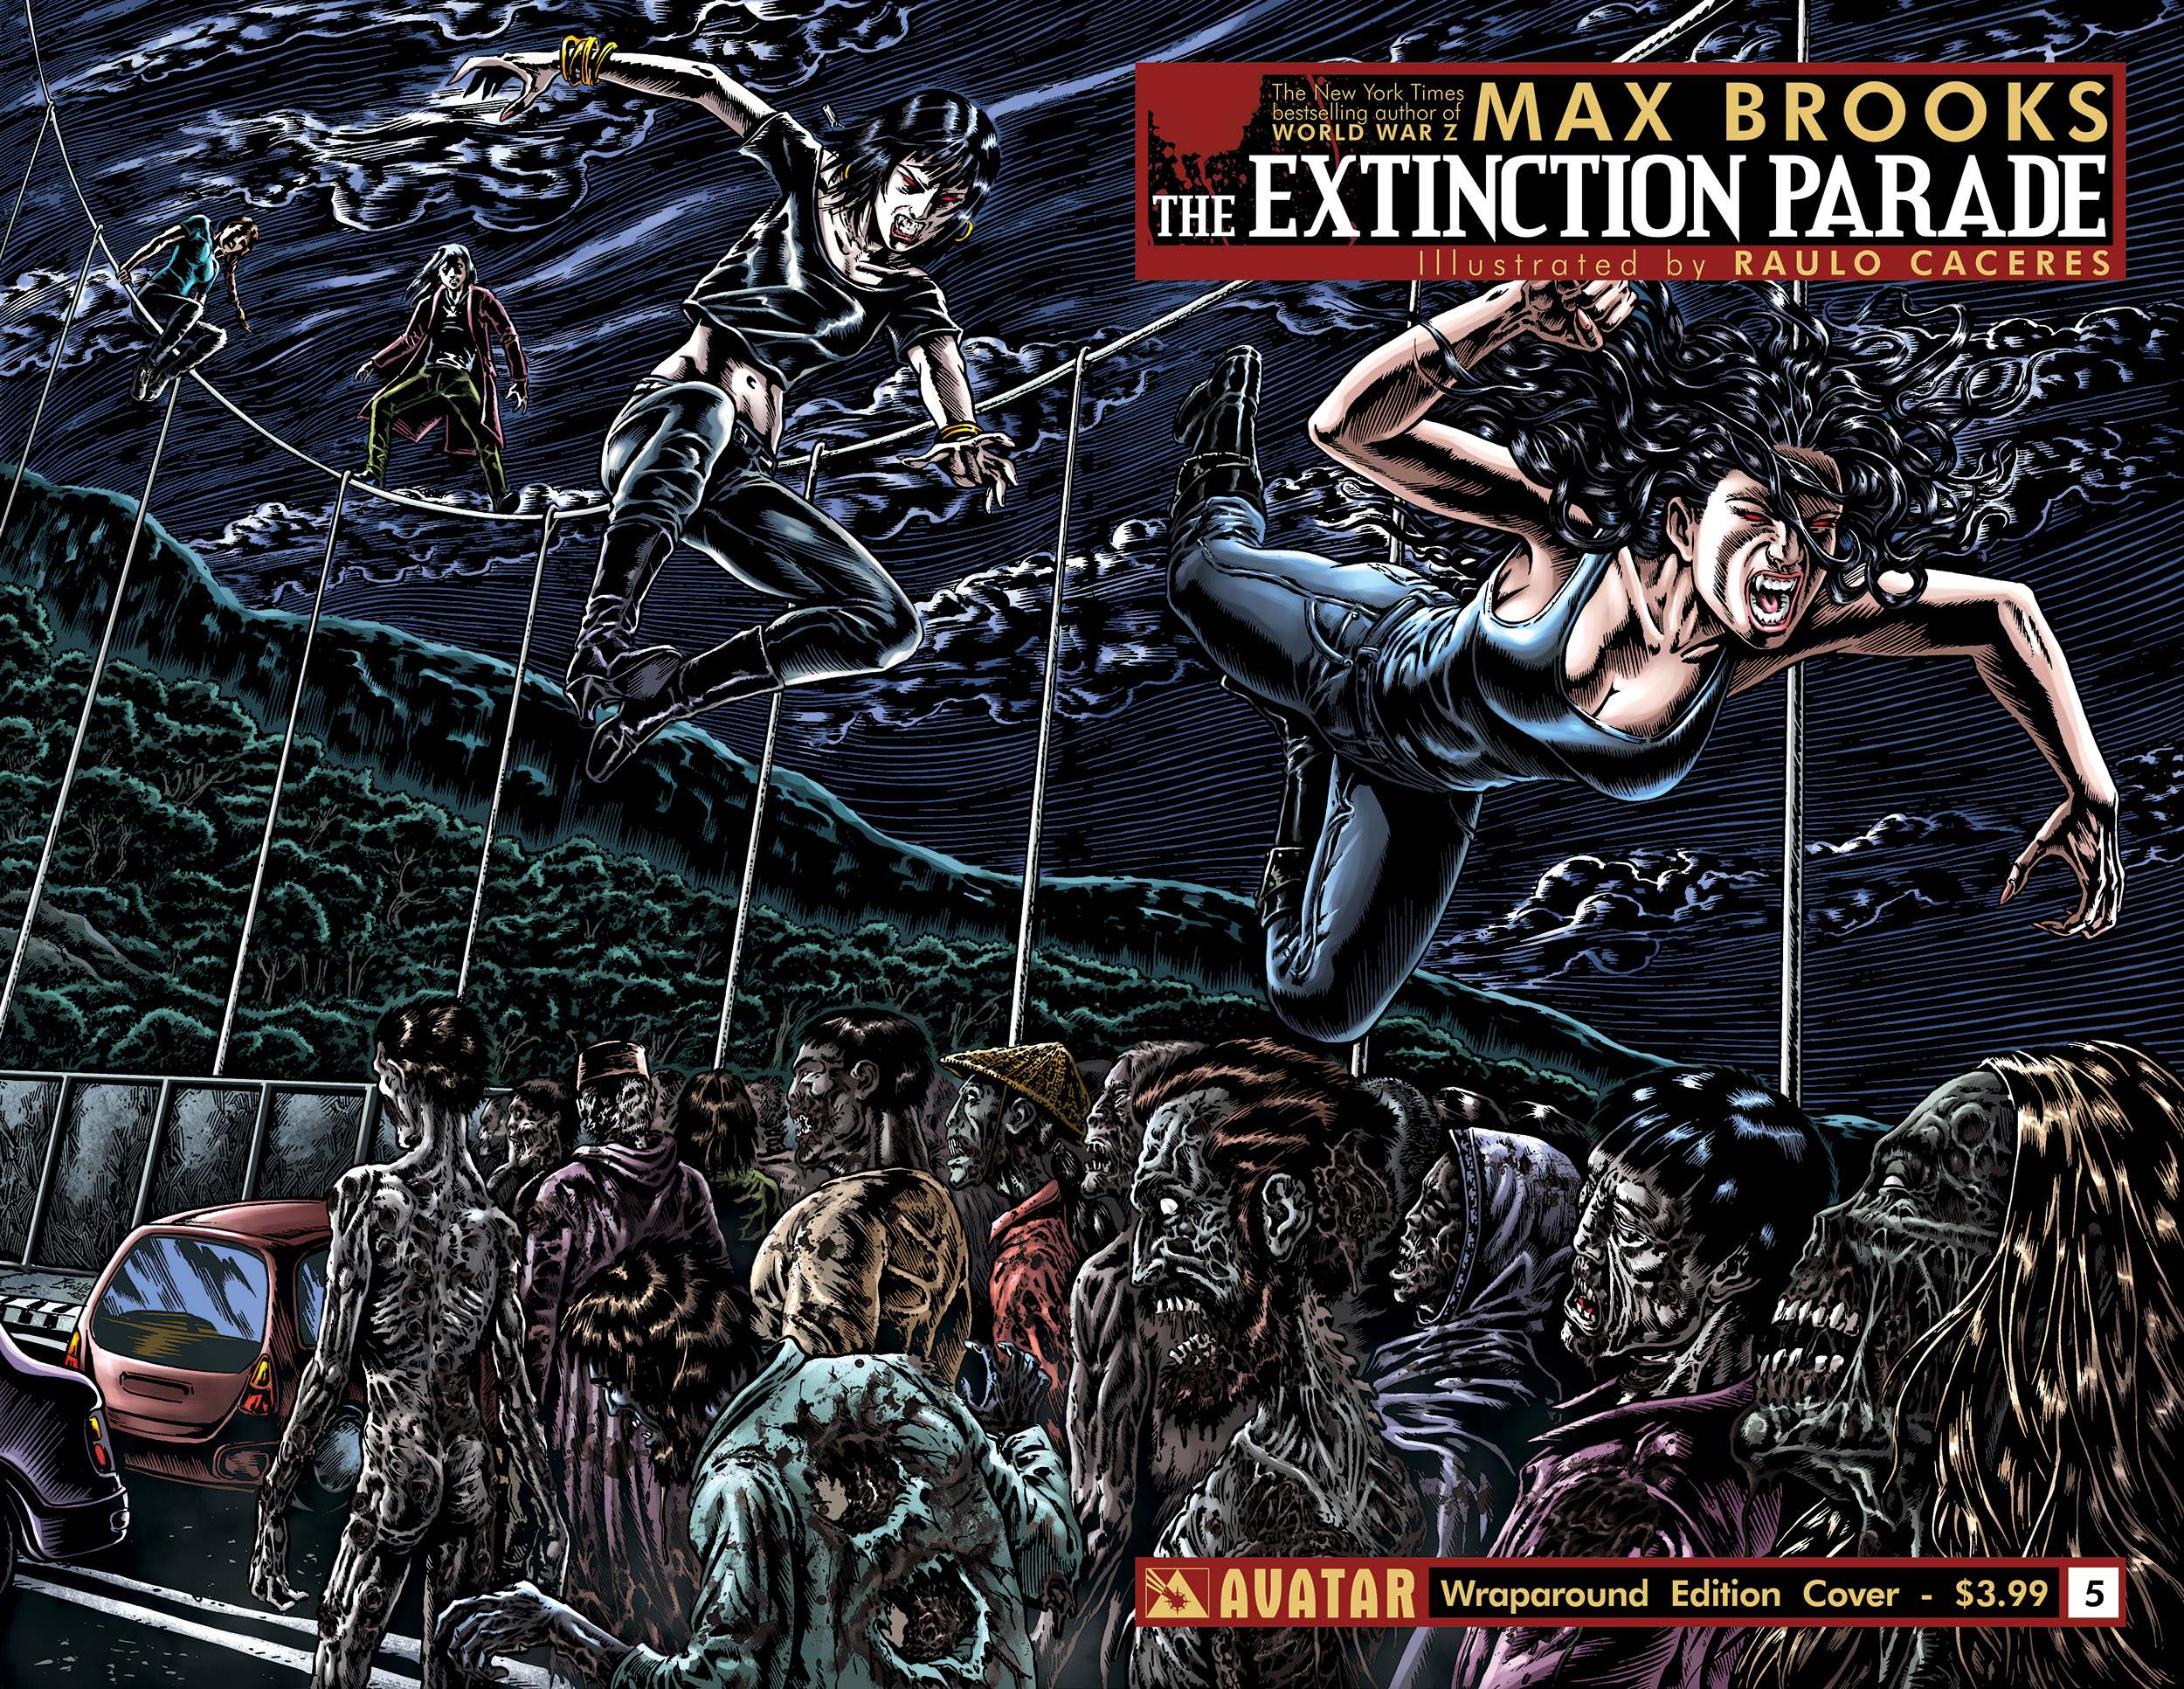 Amazing Extinction Parade Pictures & Backgrounds